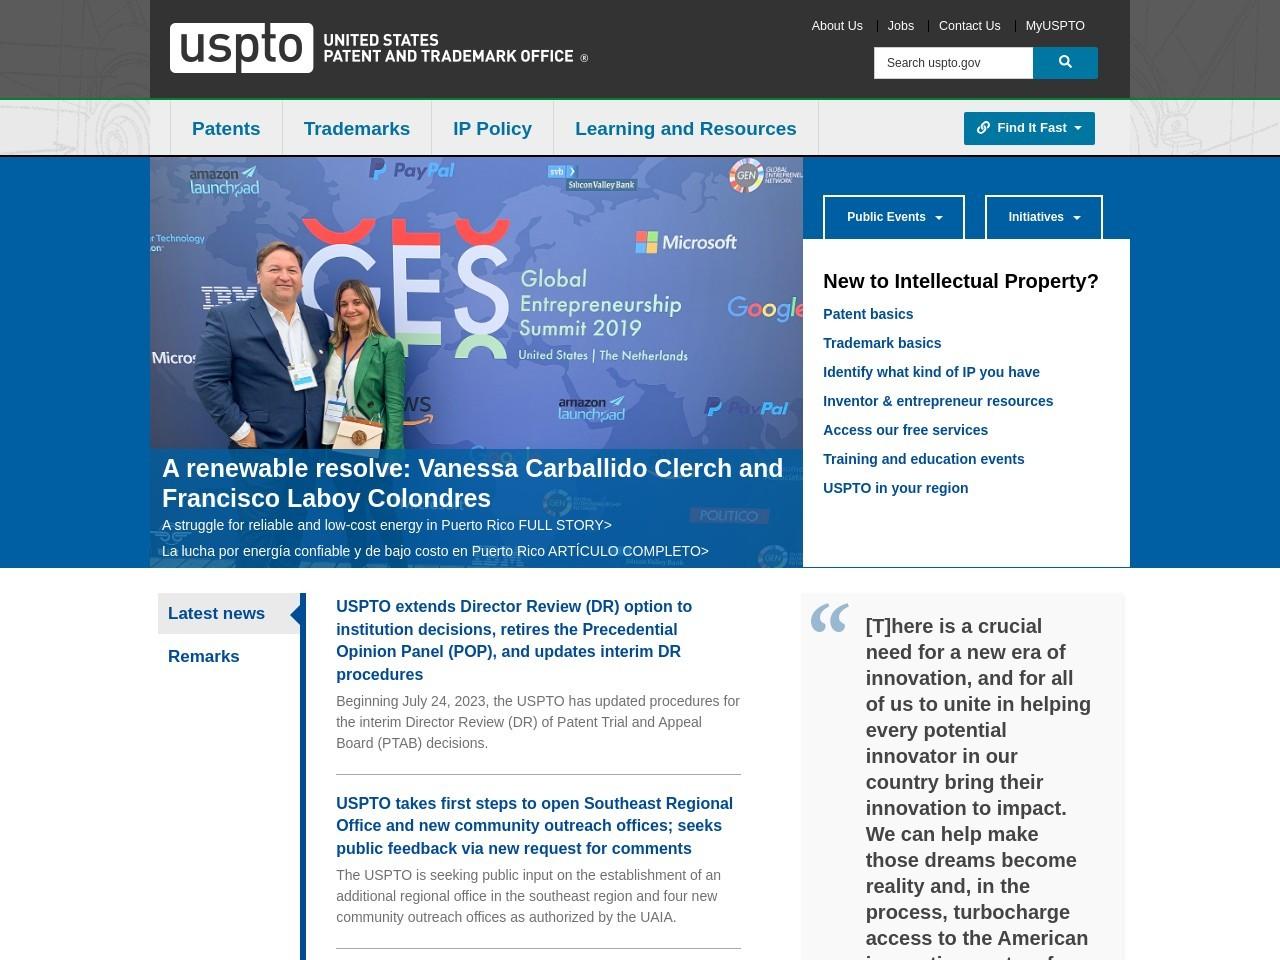 uspto.gov